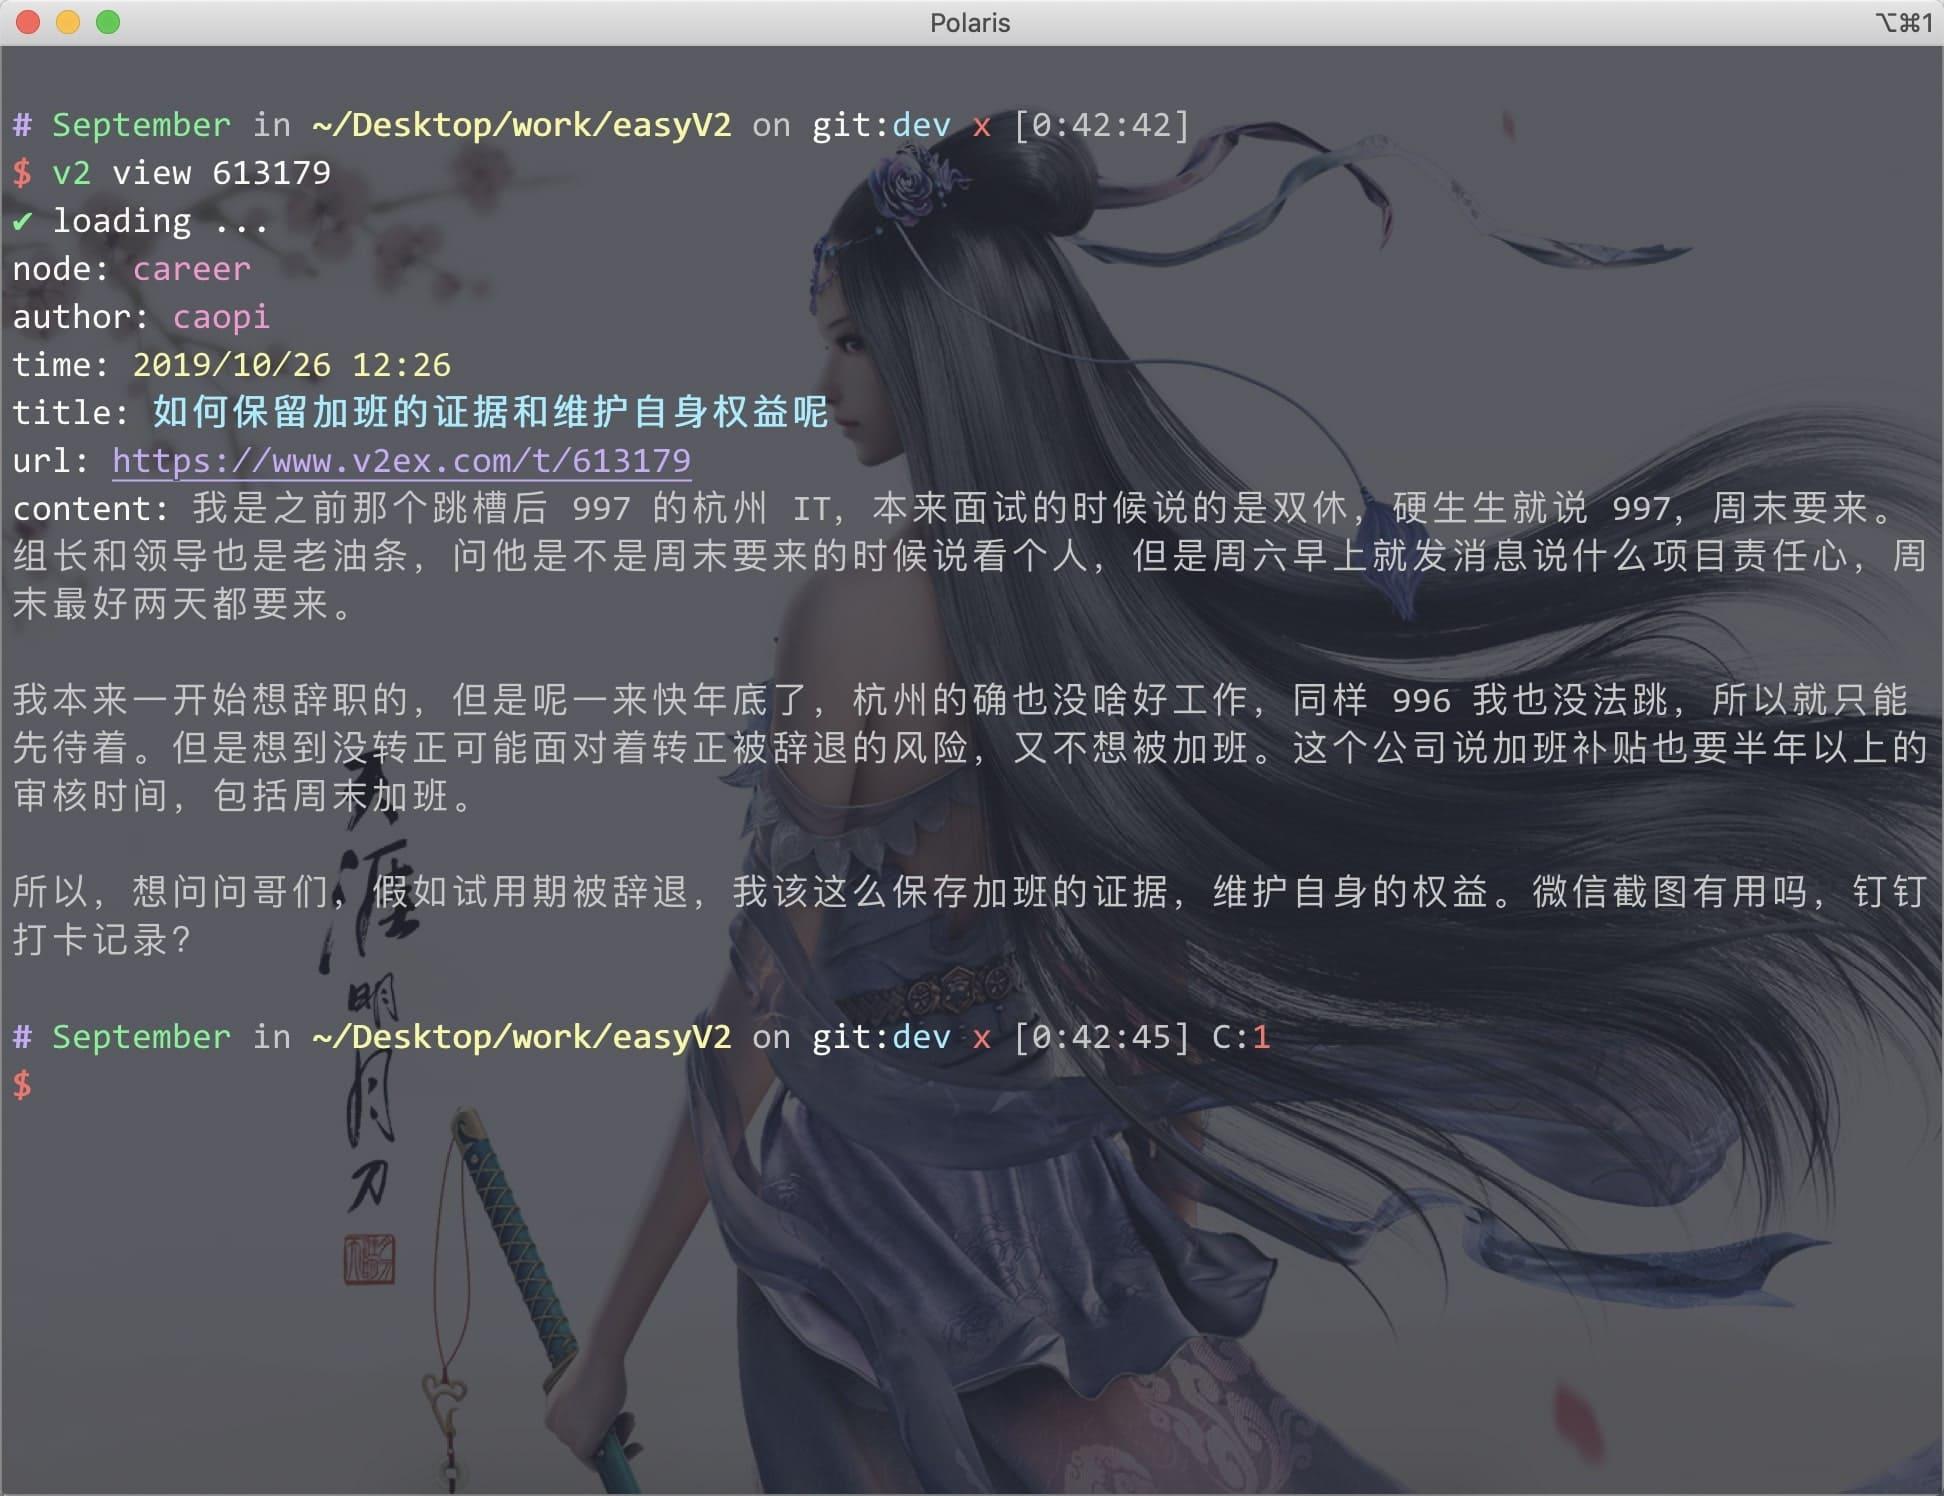 v2view.jpg